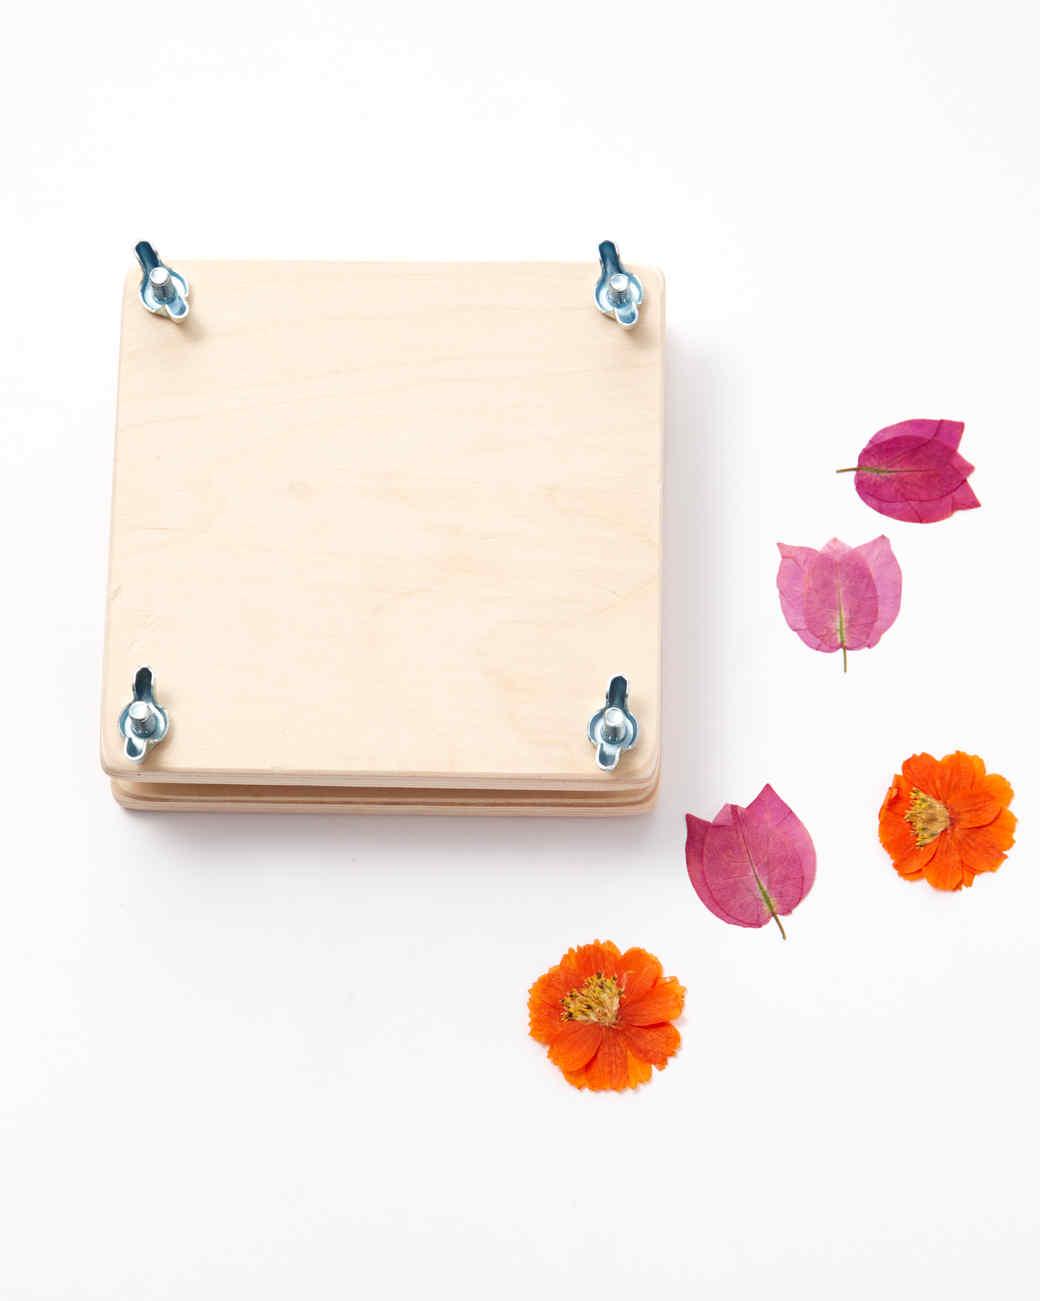 crafty-girl-basket-flower-press-3719-d112789-0116.jpg